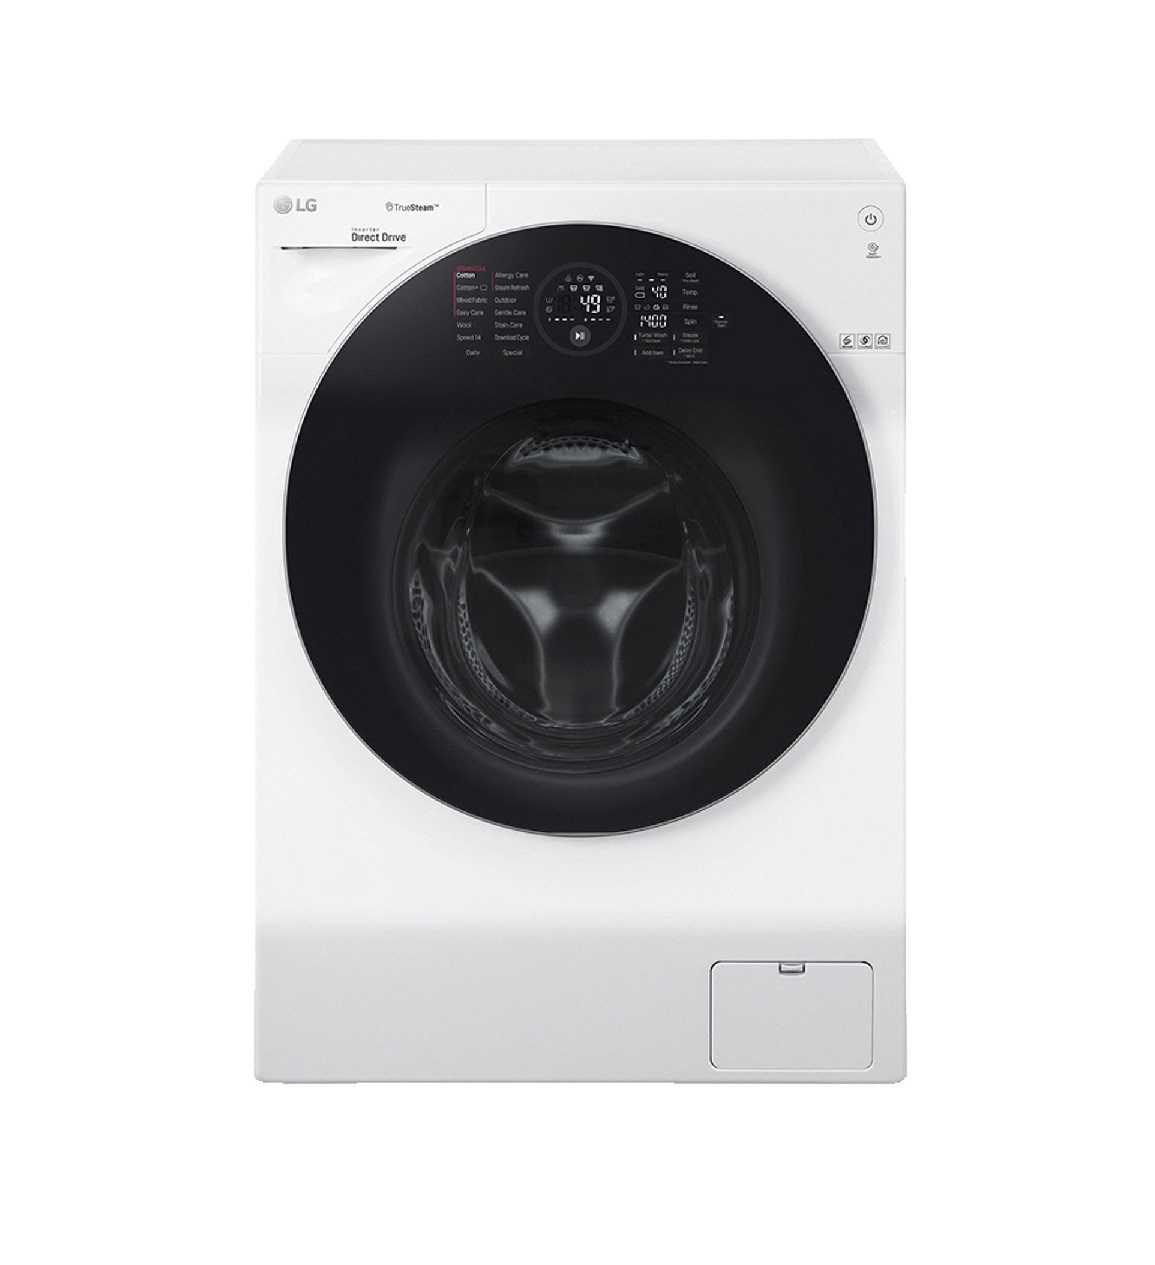 lg waschmaschine f14 wm 10gt fuer 10kg nur 63890e inkl versand statt 899 e 1